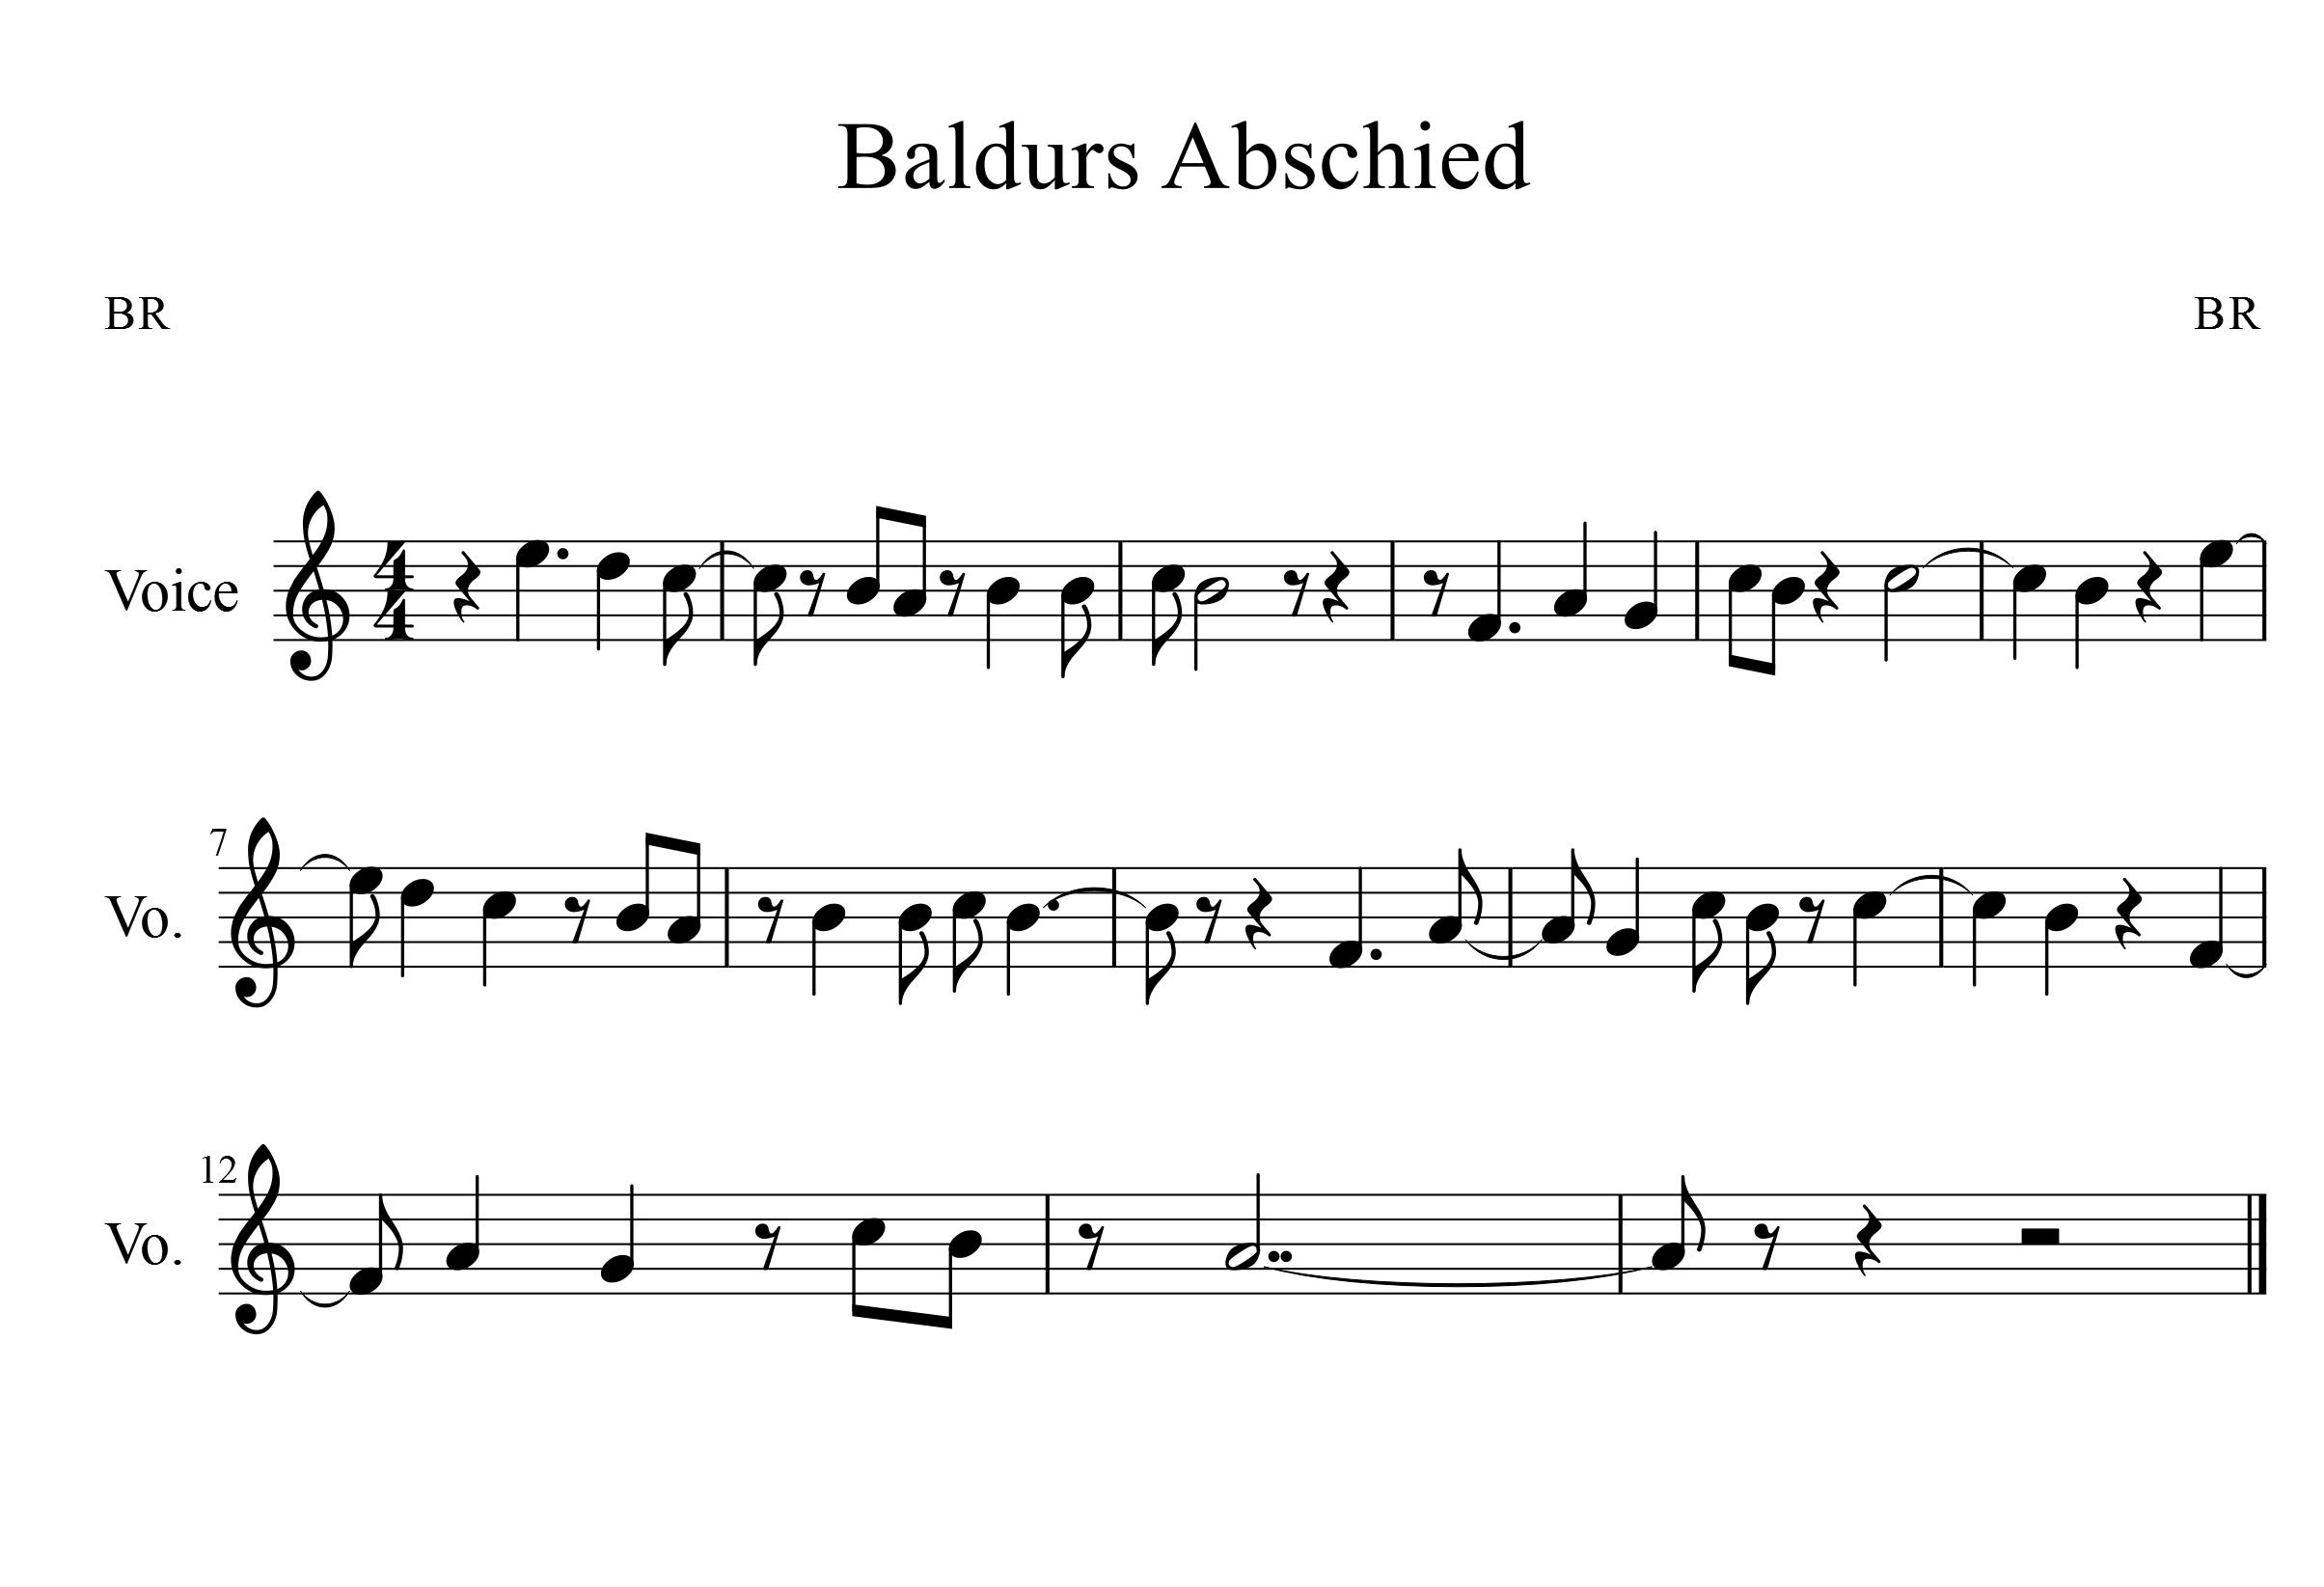 Baldurs_Abschied-1